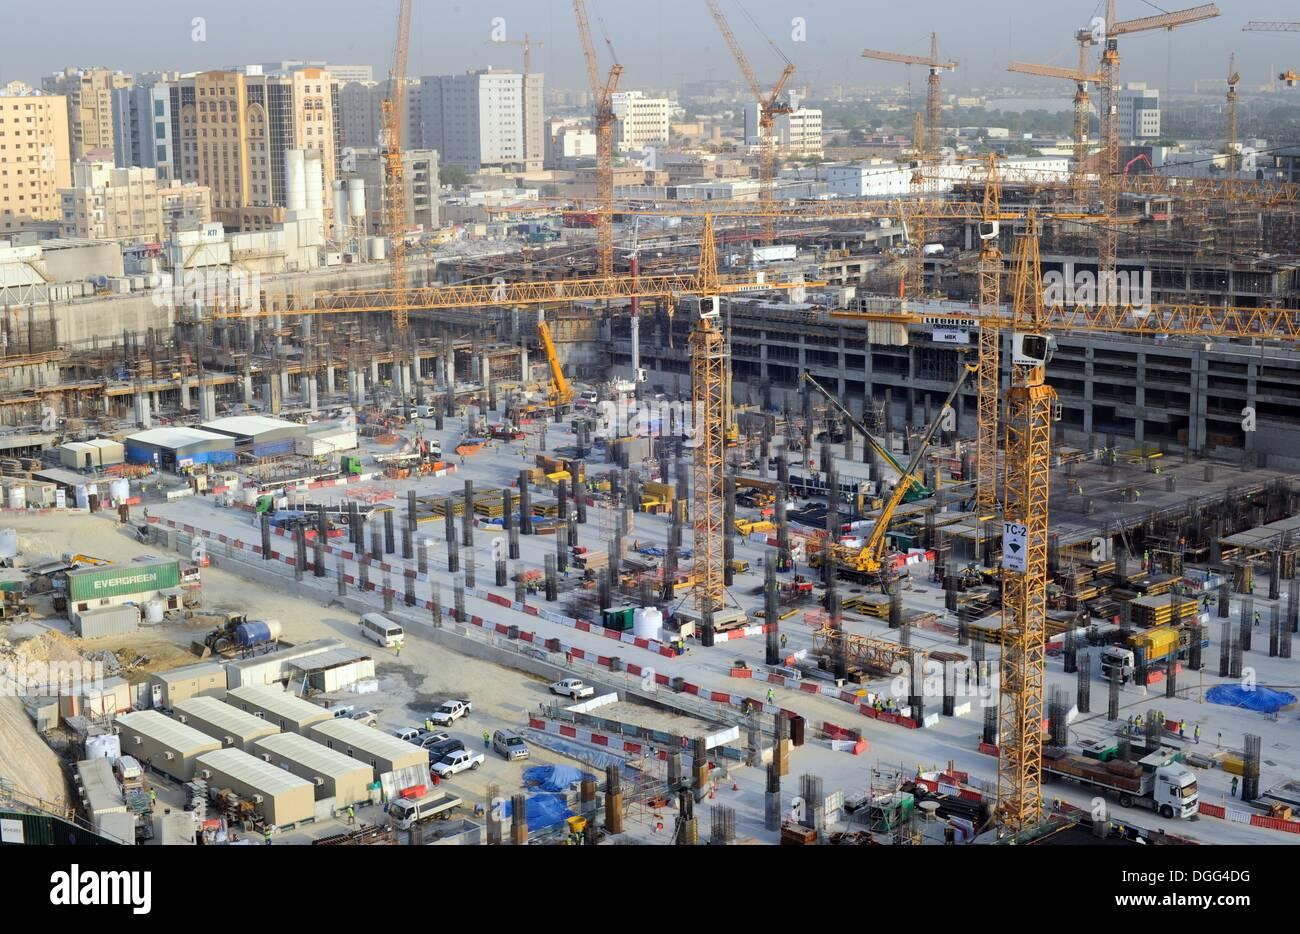 Doha, Qatar. 29th Aug, 2013. Aerial of construction sites in Doha, Qatar, 29 August 2013. Photo: Britta Pedersen/dpa/Alamy Live News - Stock Image